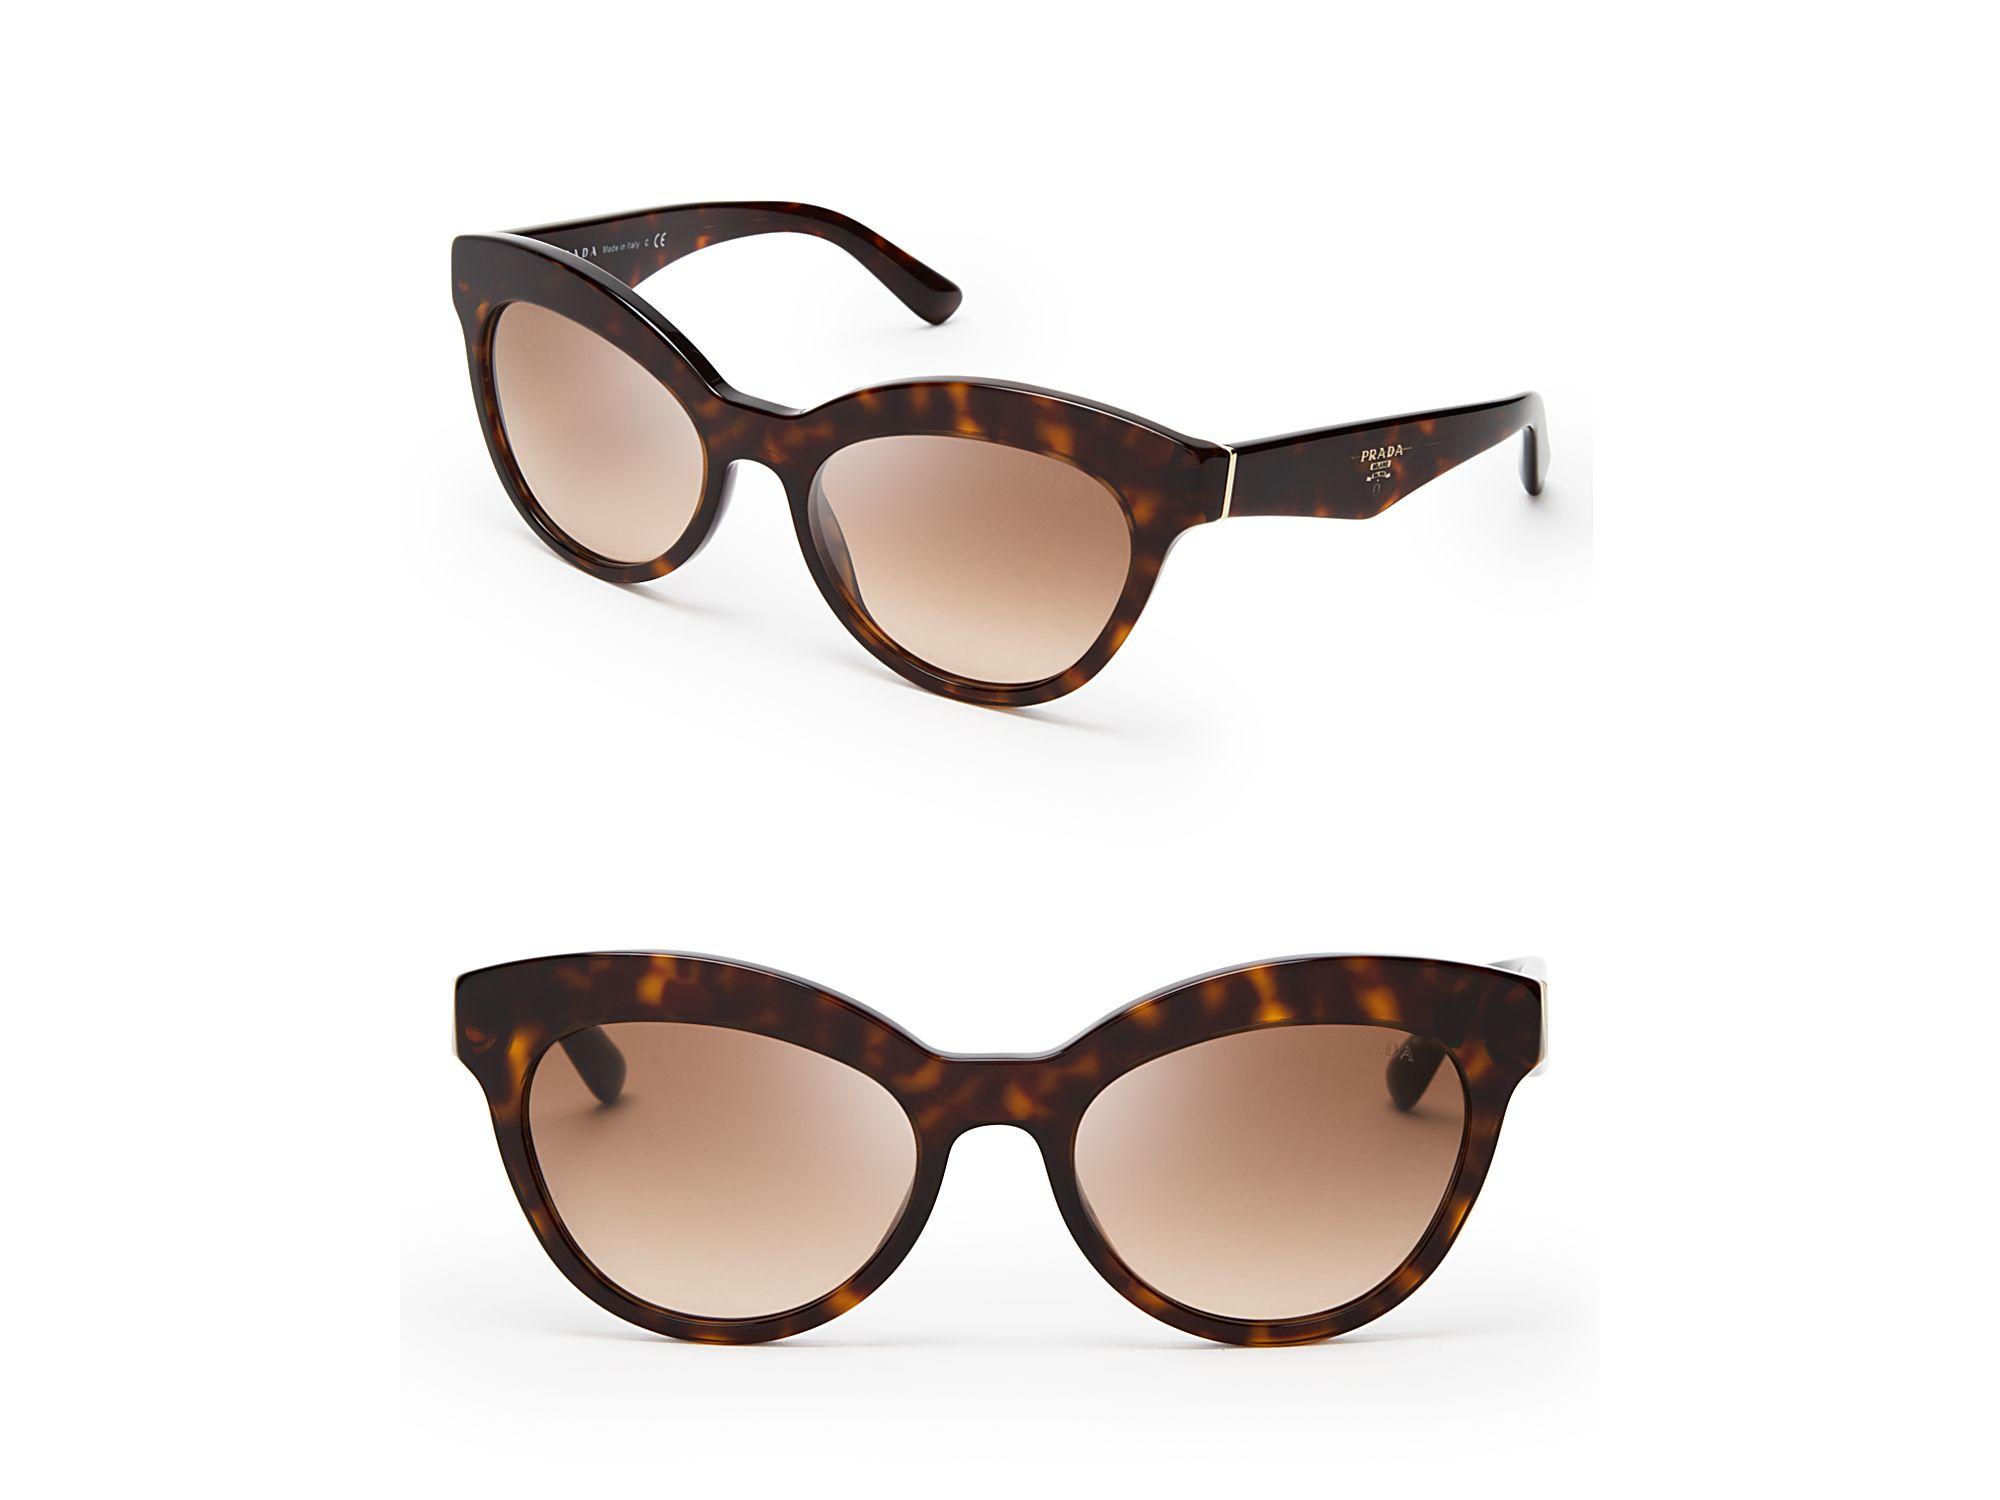 8517ebdd2fdb ... france lyst prada heritage cat eye sunglasses in brown 4c34e dafdb